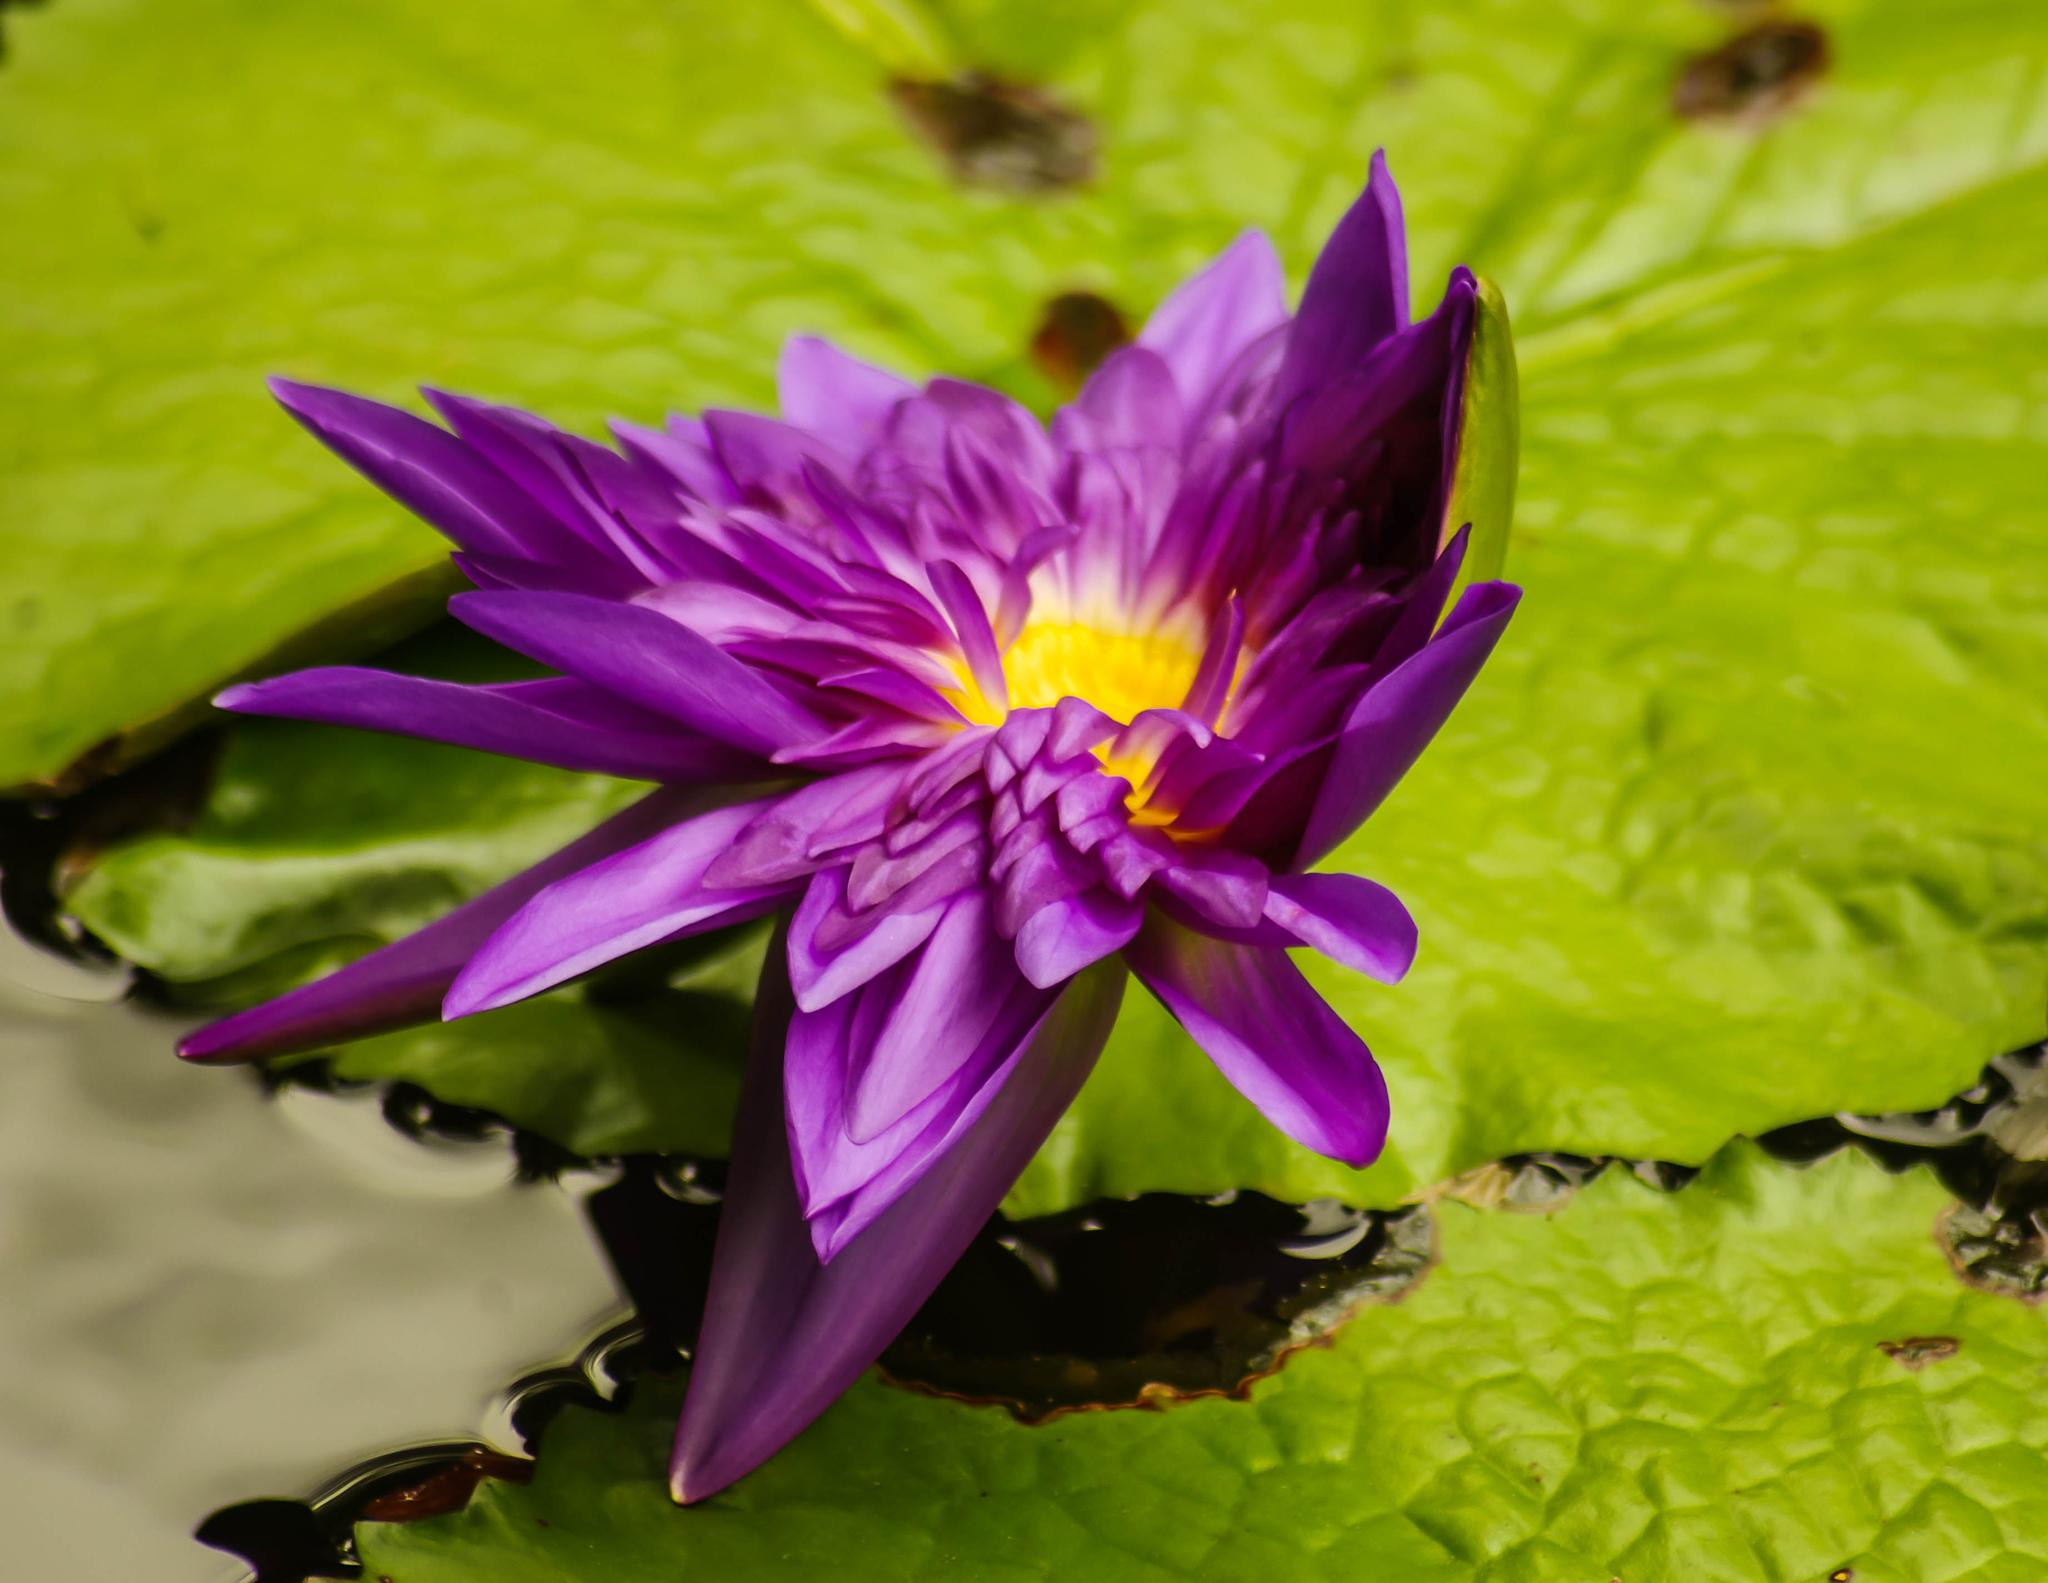 Purple Euphoria by lesliermccree